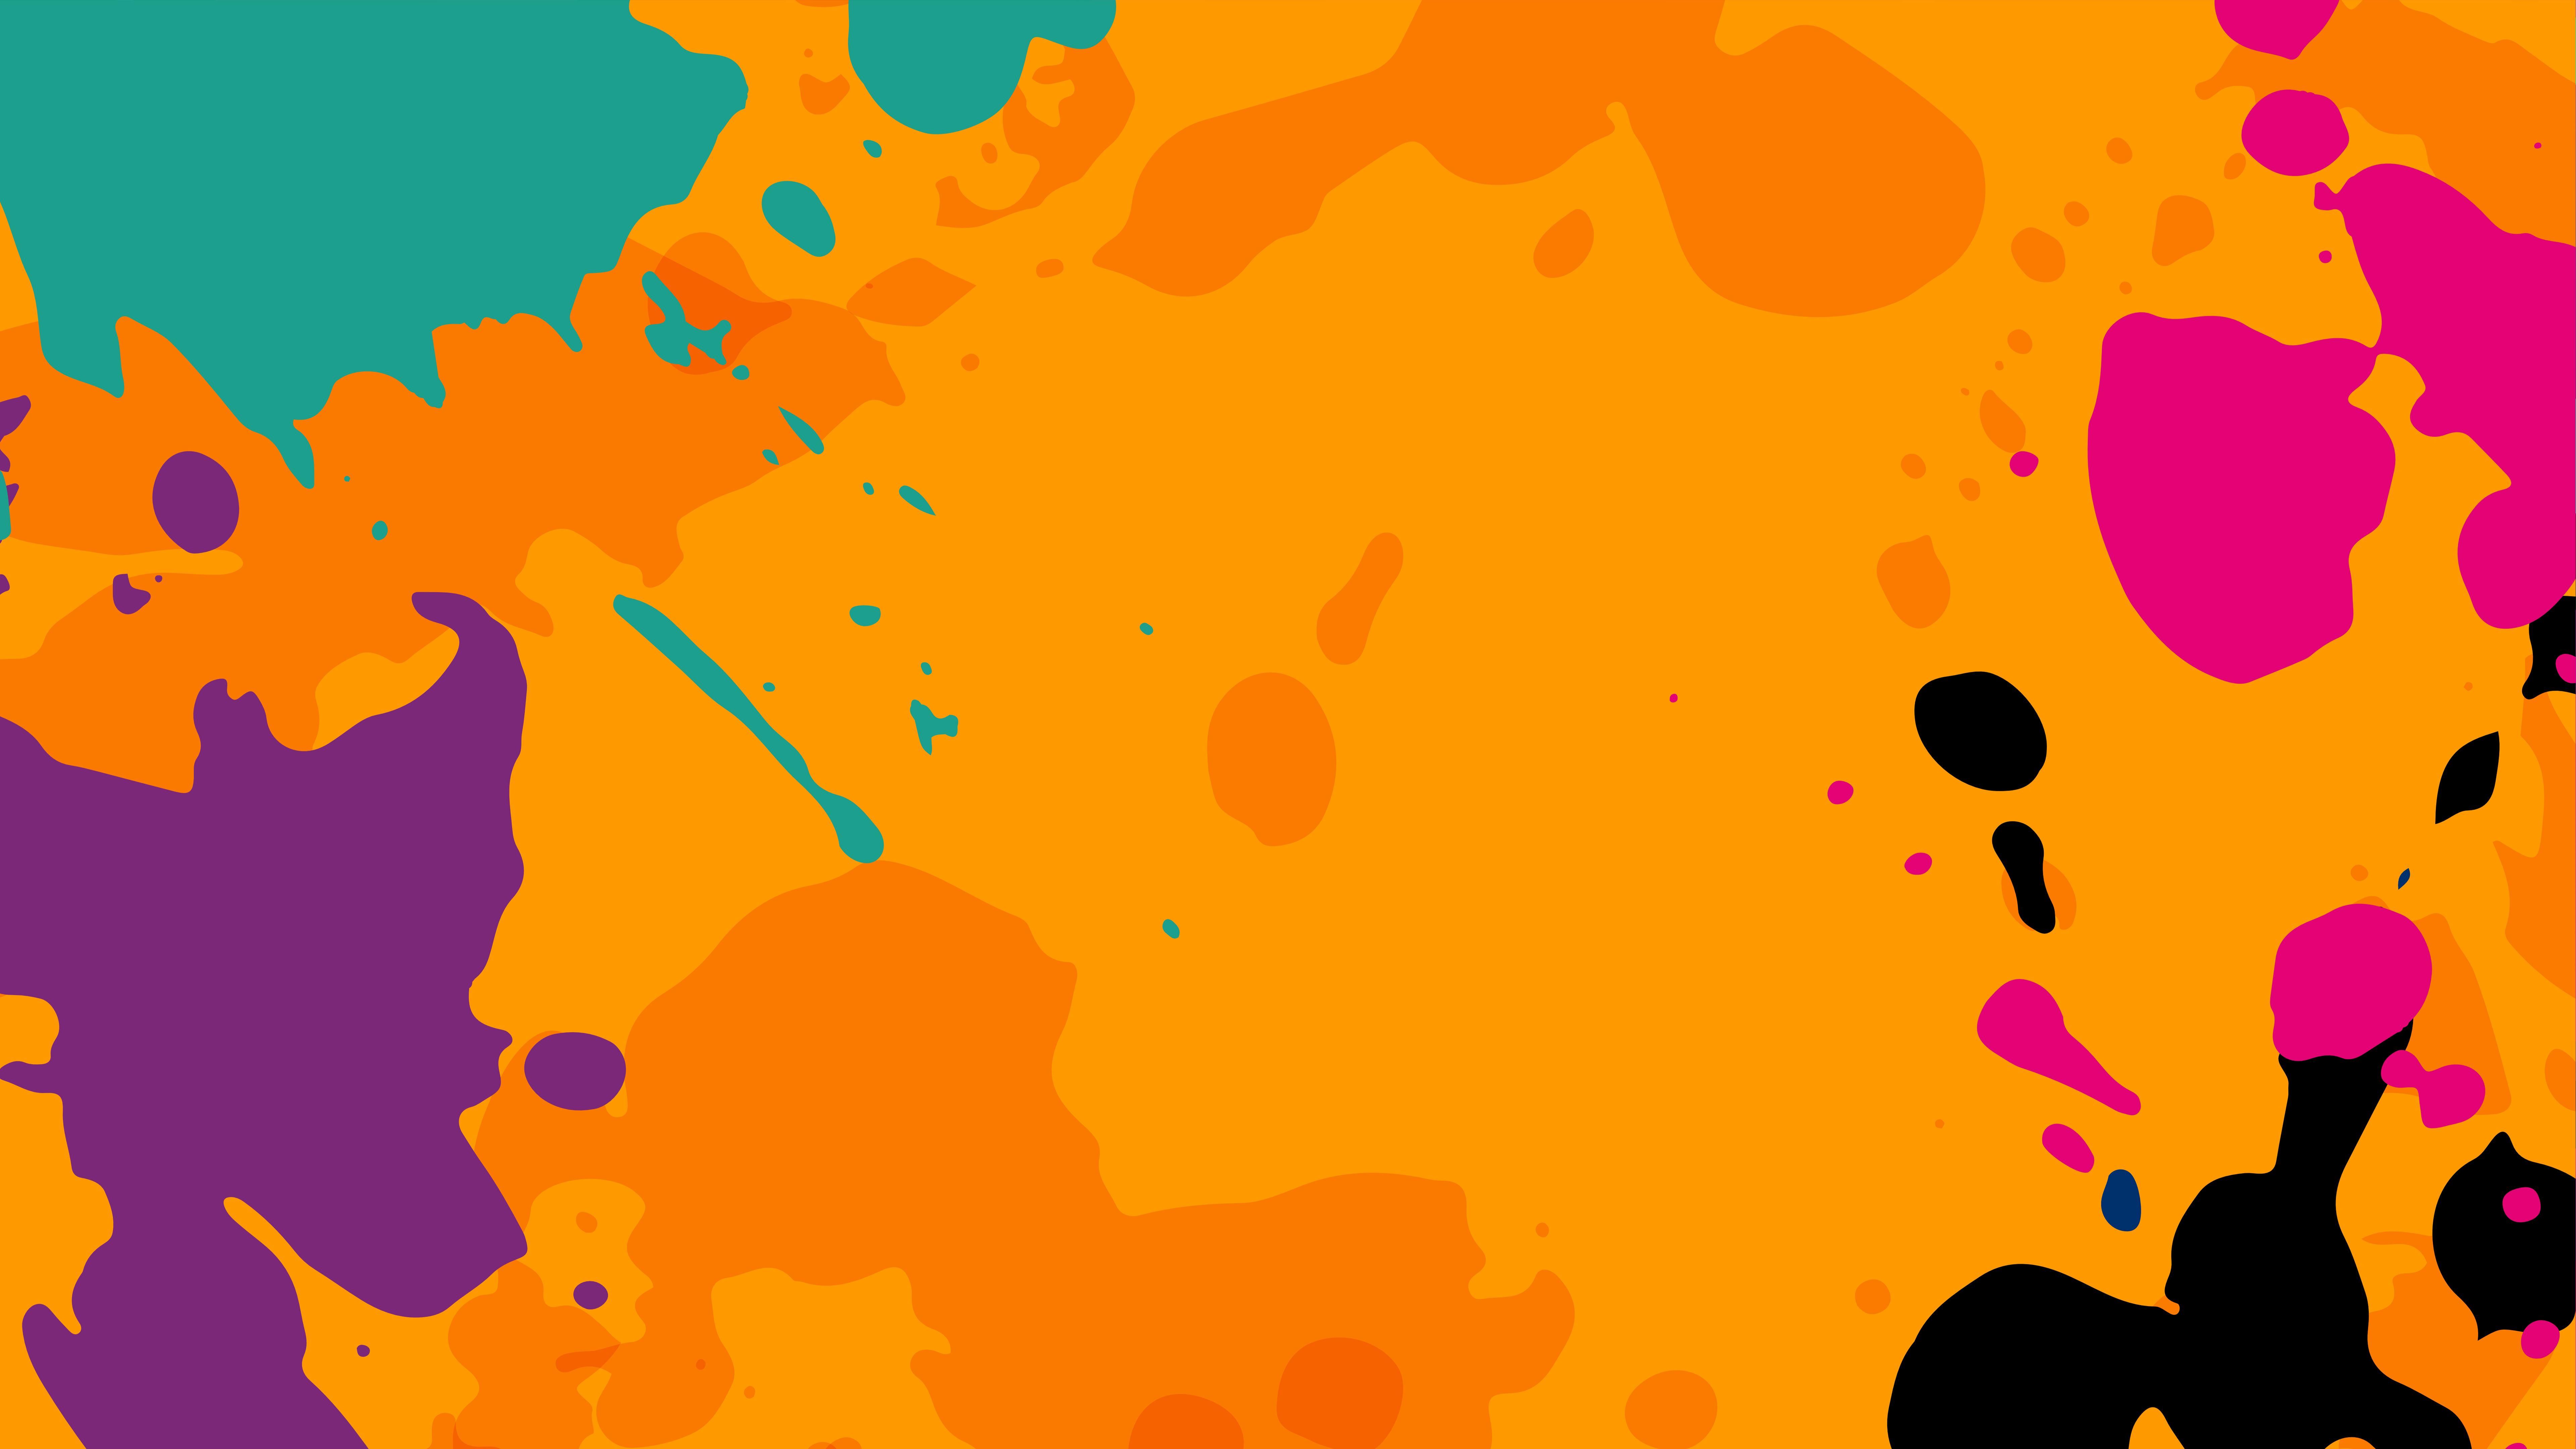 orange colour splashes 4k 1614437772 - Orange Colour Splashes 4k - Orange Colour Splashes 4k wallpapers